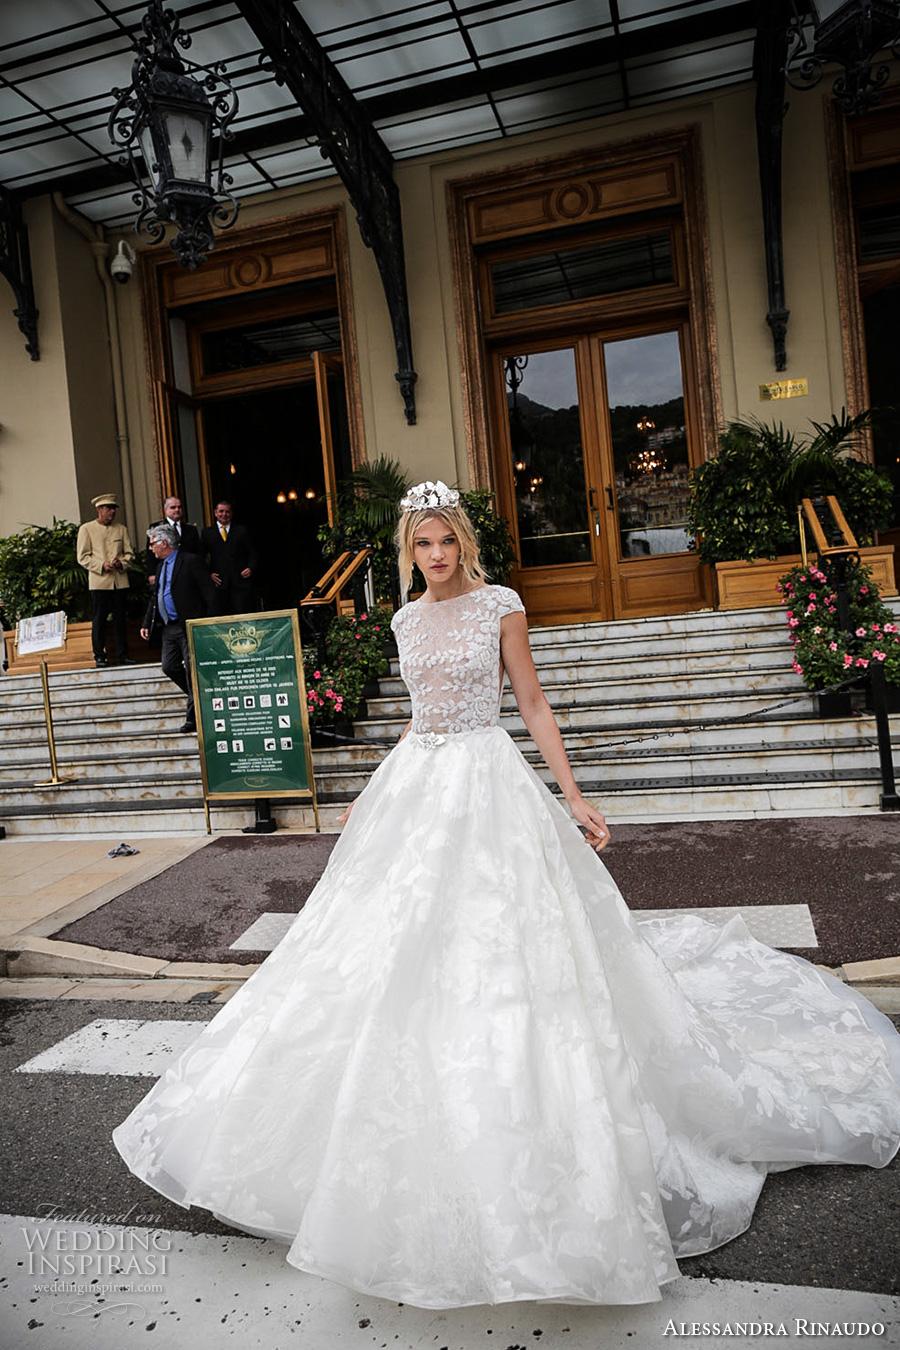 89a987b07a55 alessandra rinaudo 2017 bridal cap sleeves bateau neckline floral heavily  embellished bodice romantic princess a line